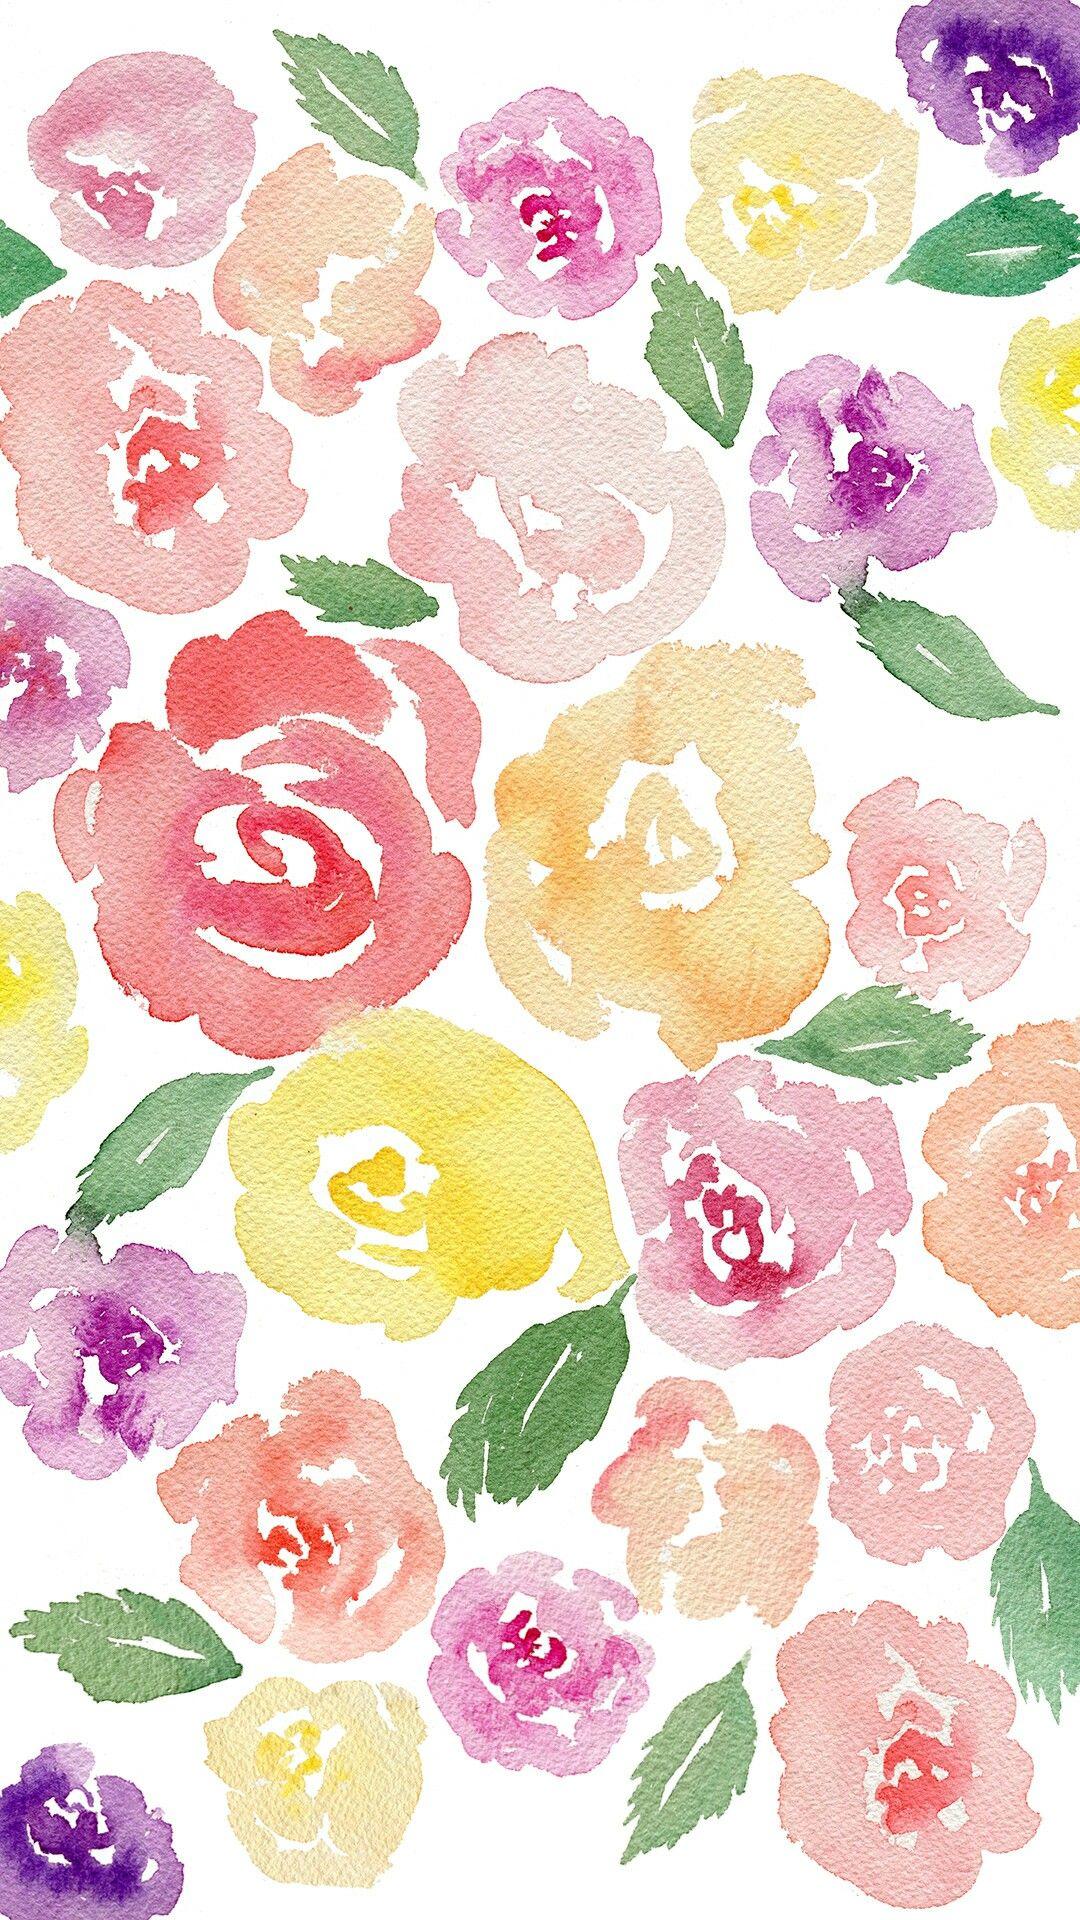 Watercolor Floral Ilustracao Da Arte Album De Casamento Arte